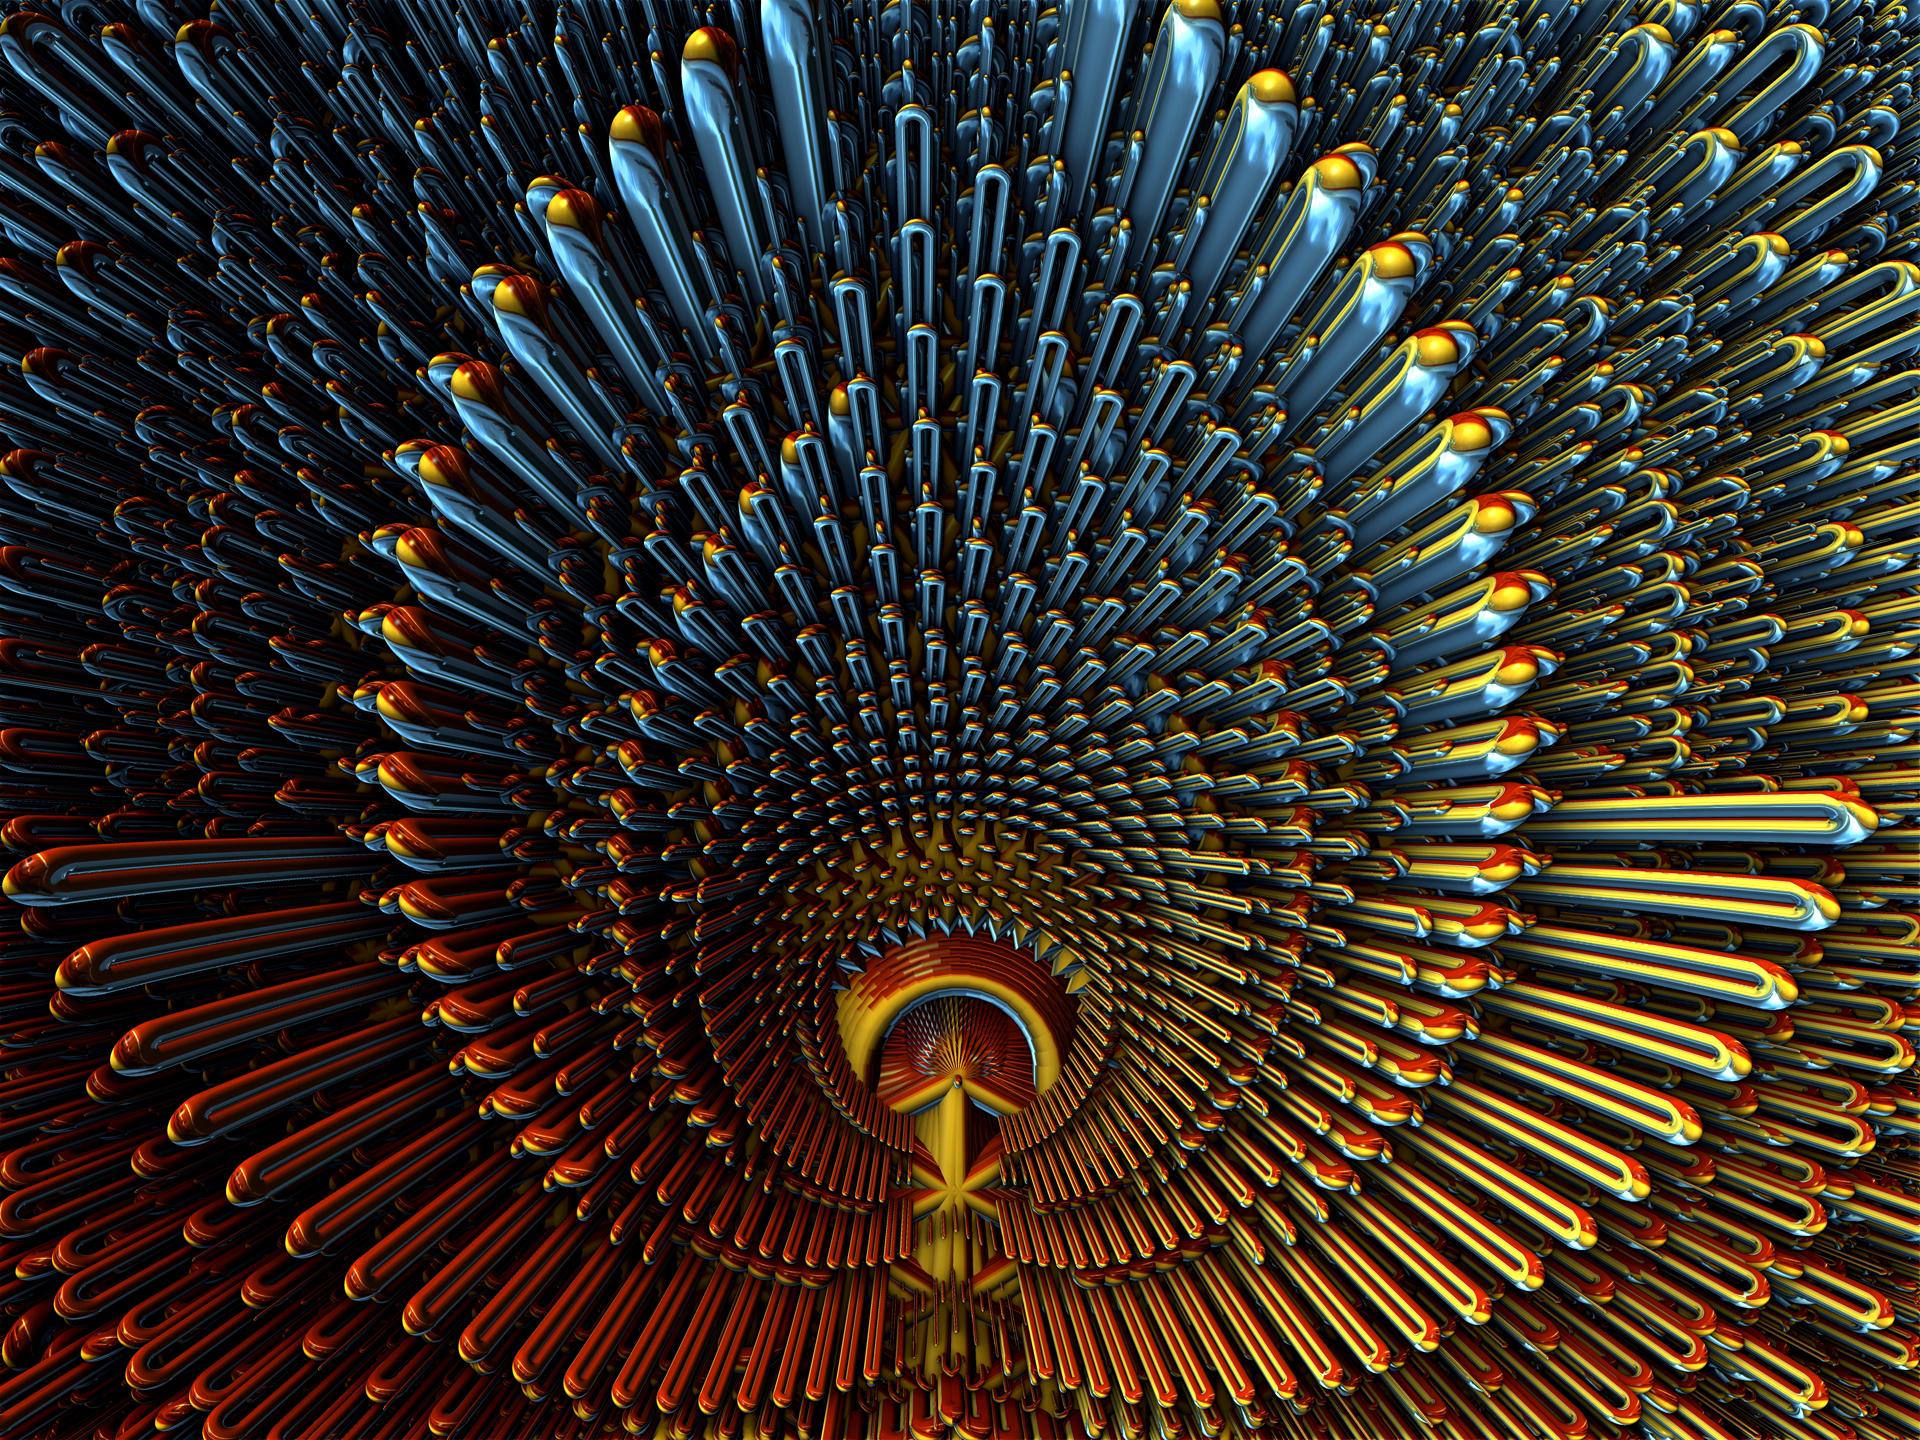 Spiraltest by viperv6